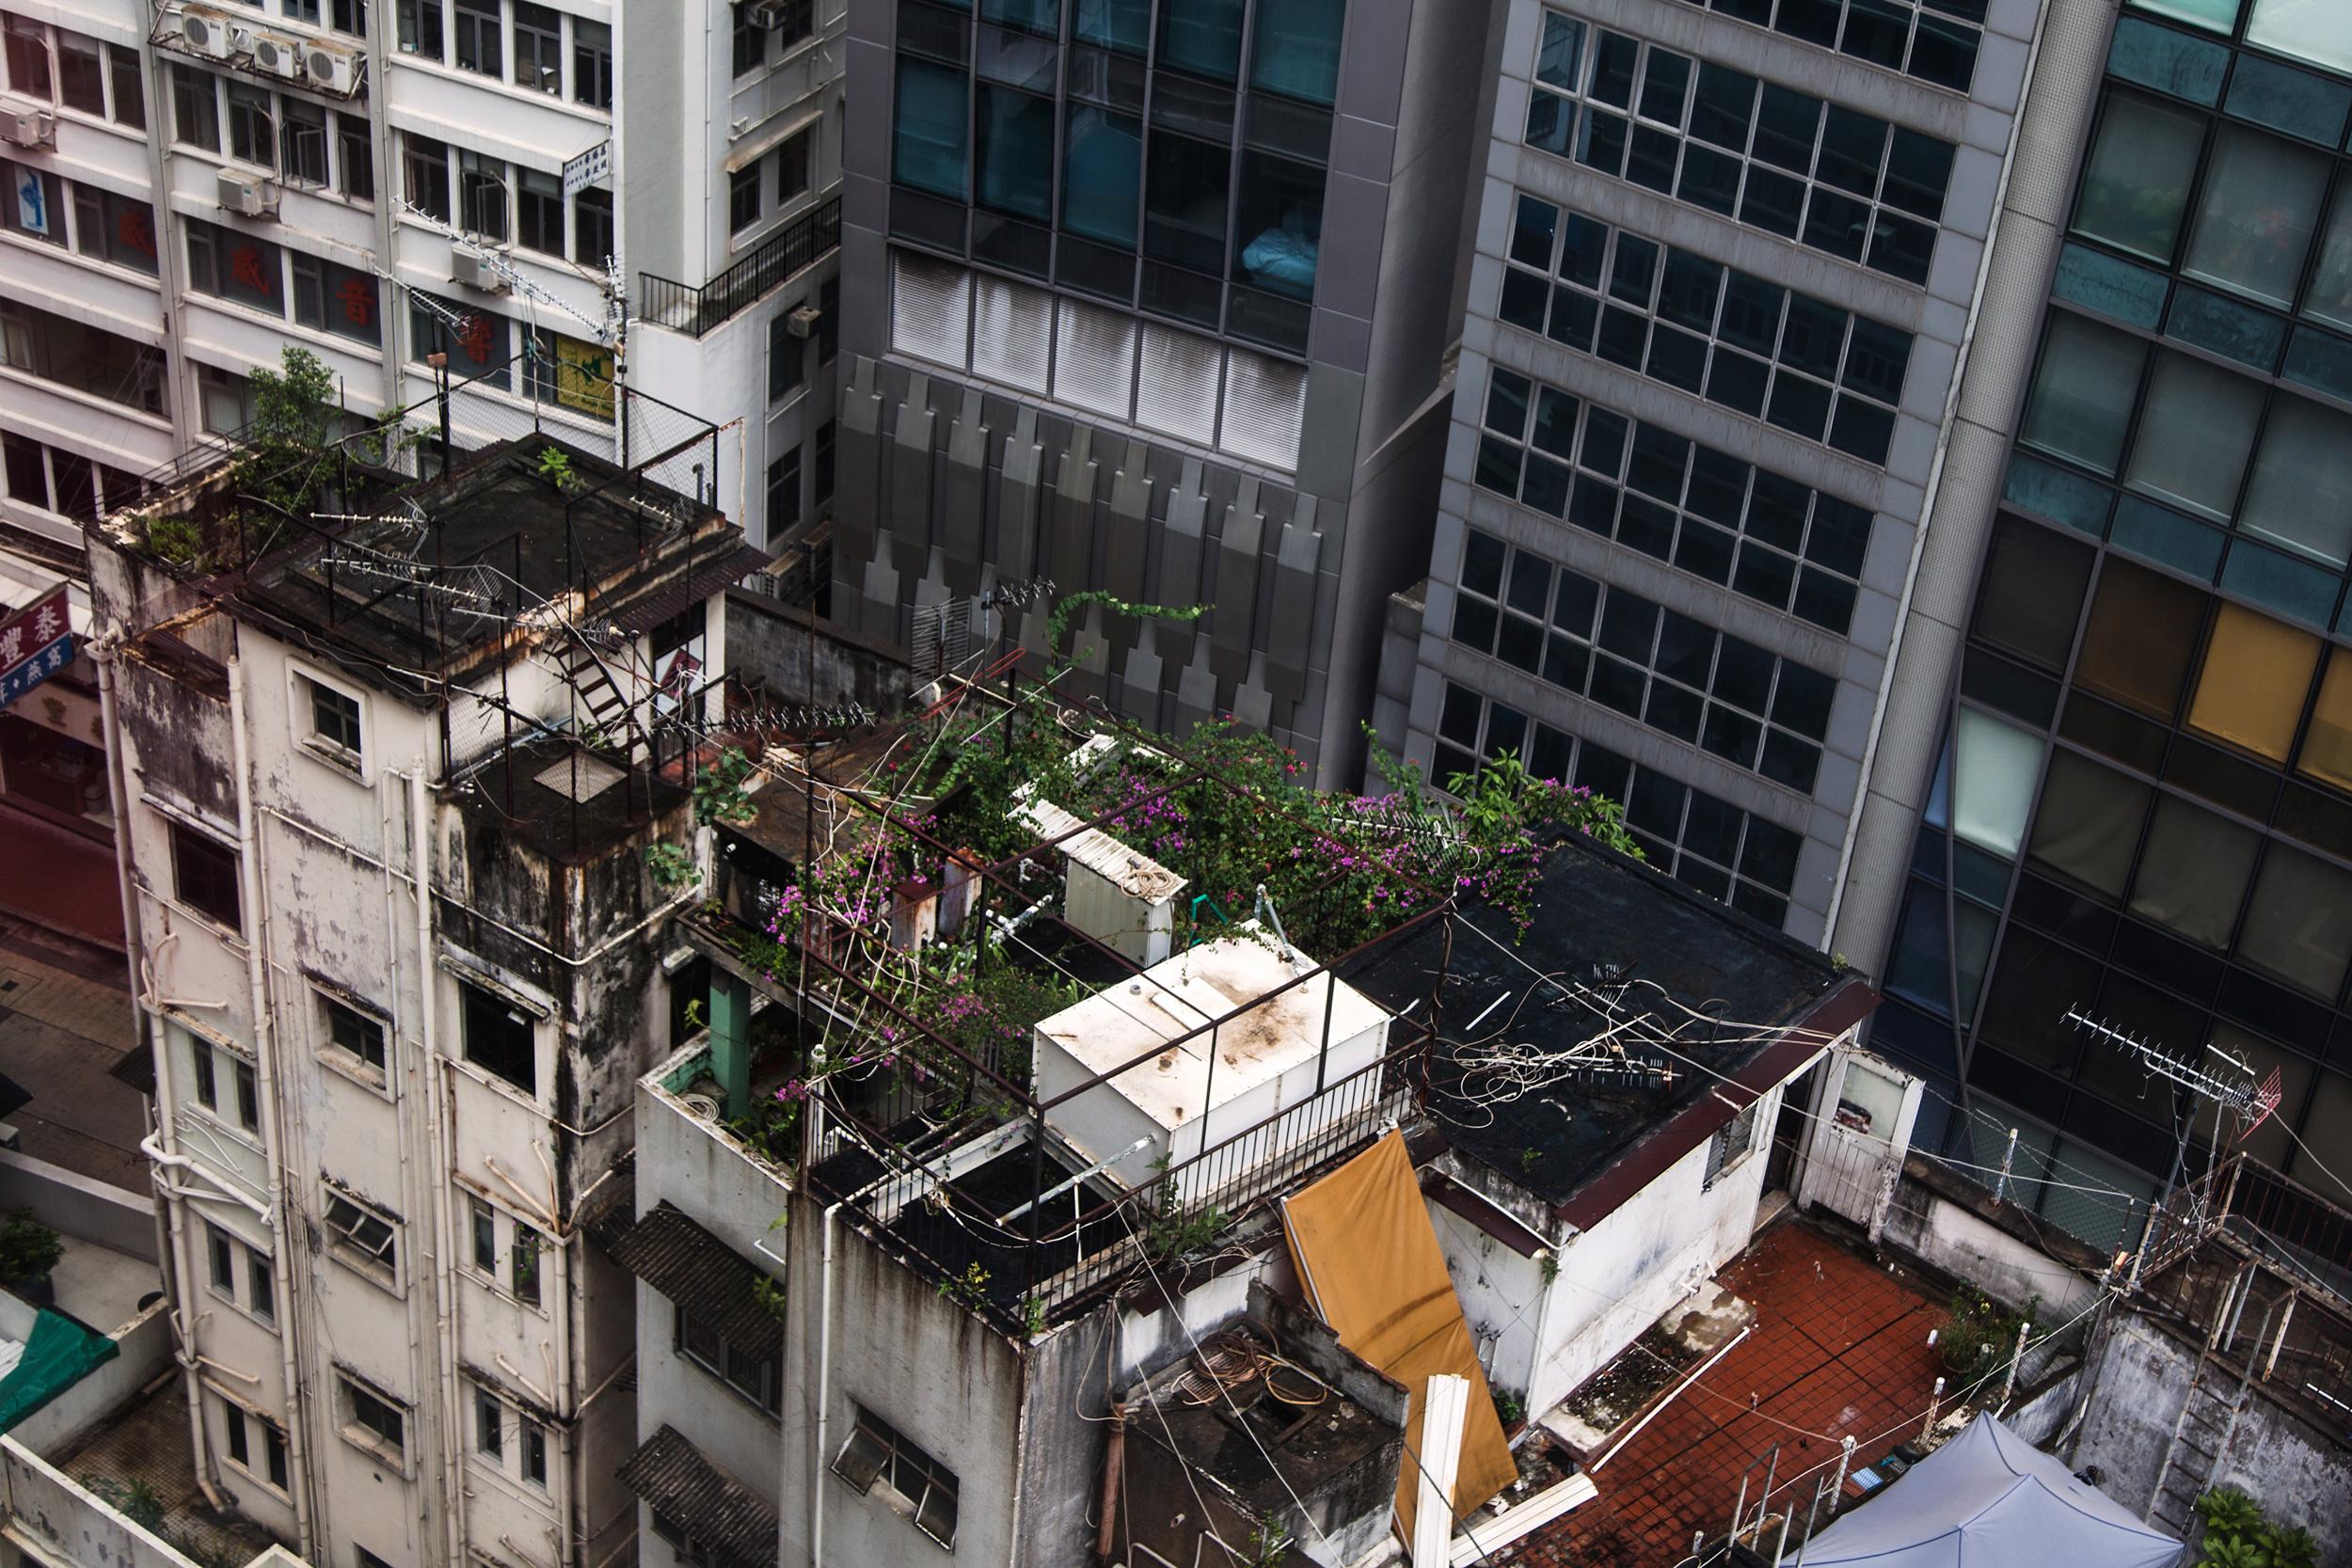 HK Rooftop